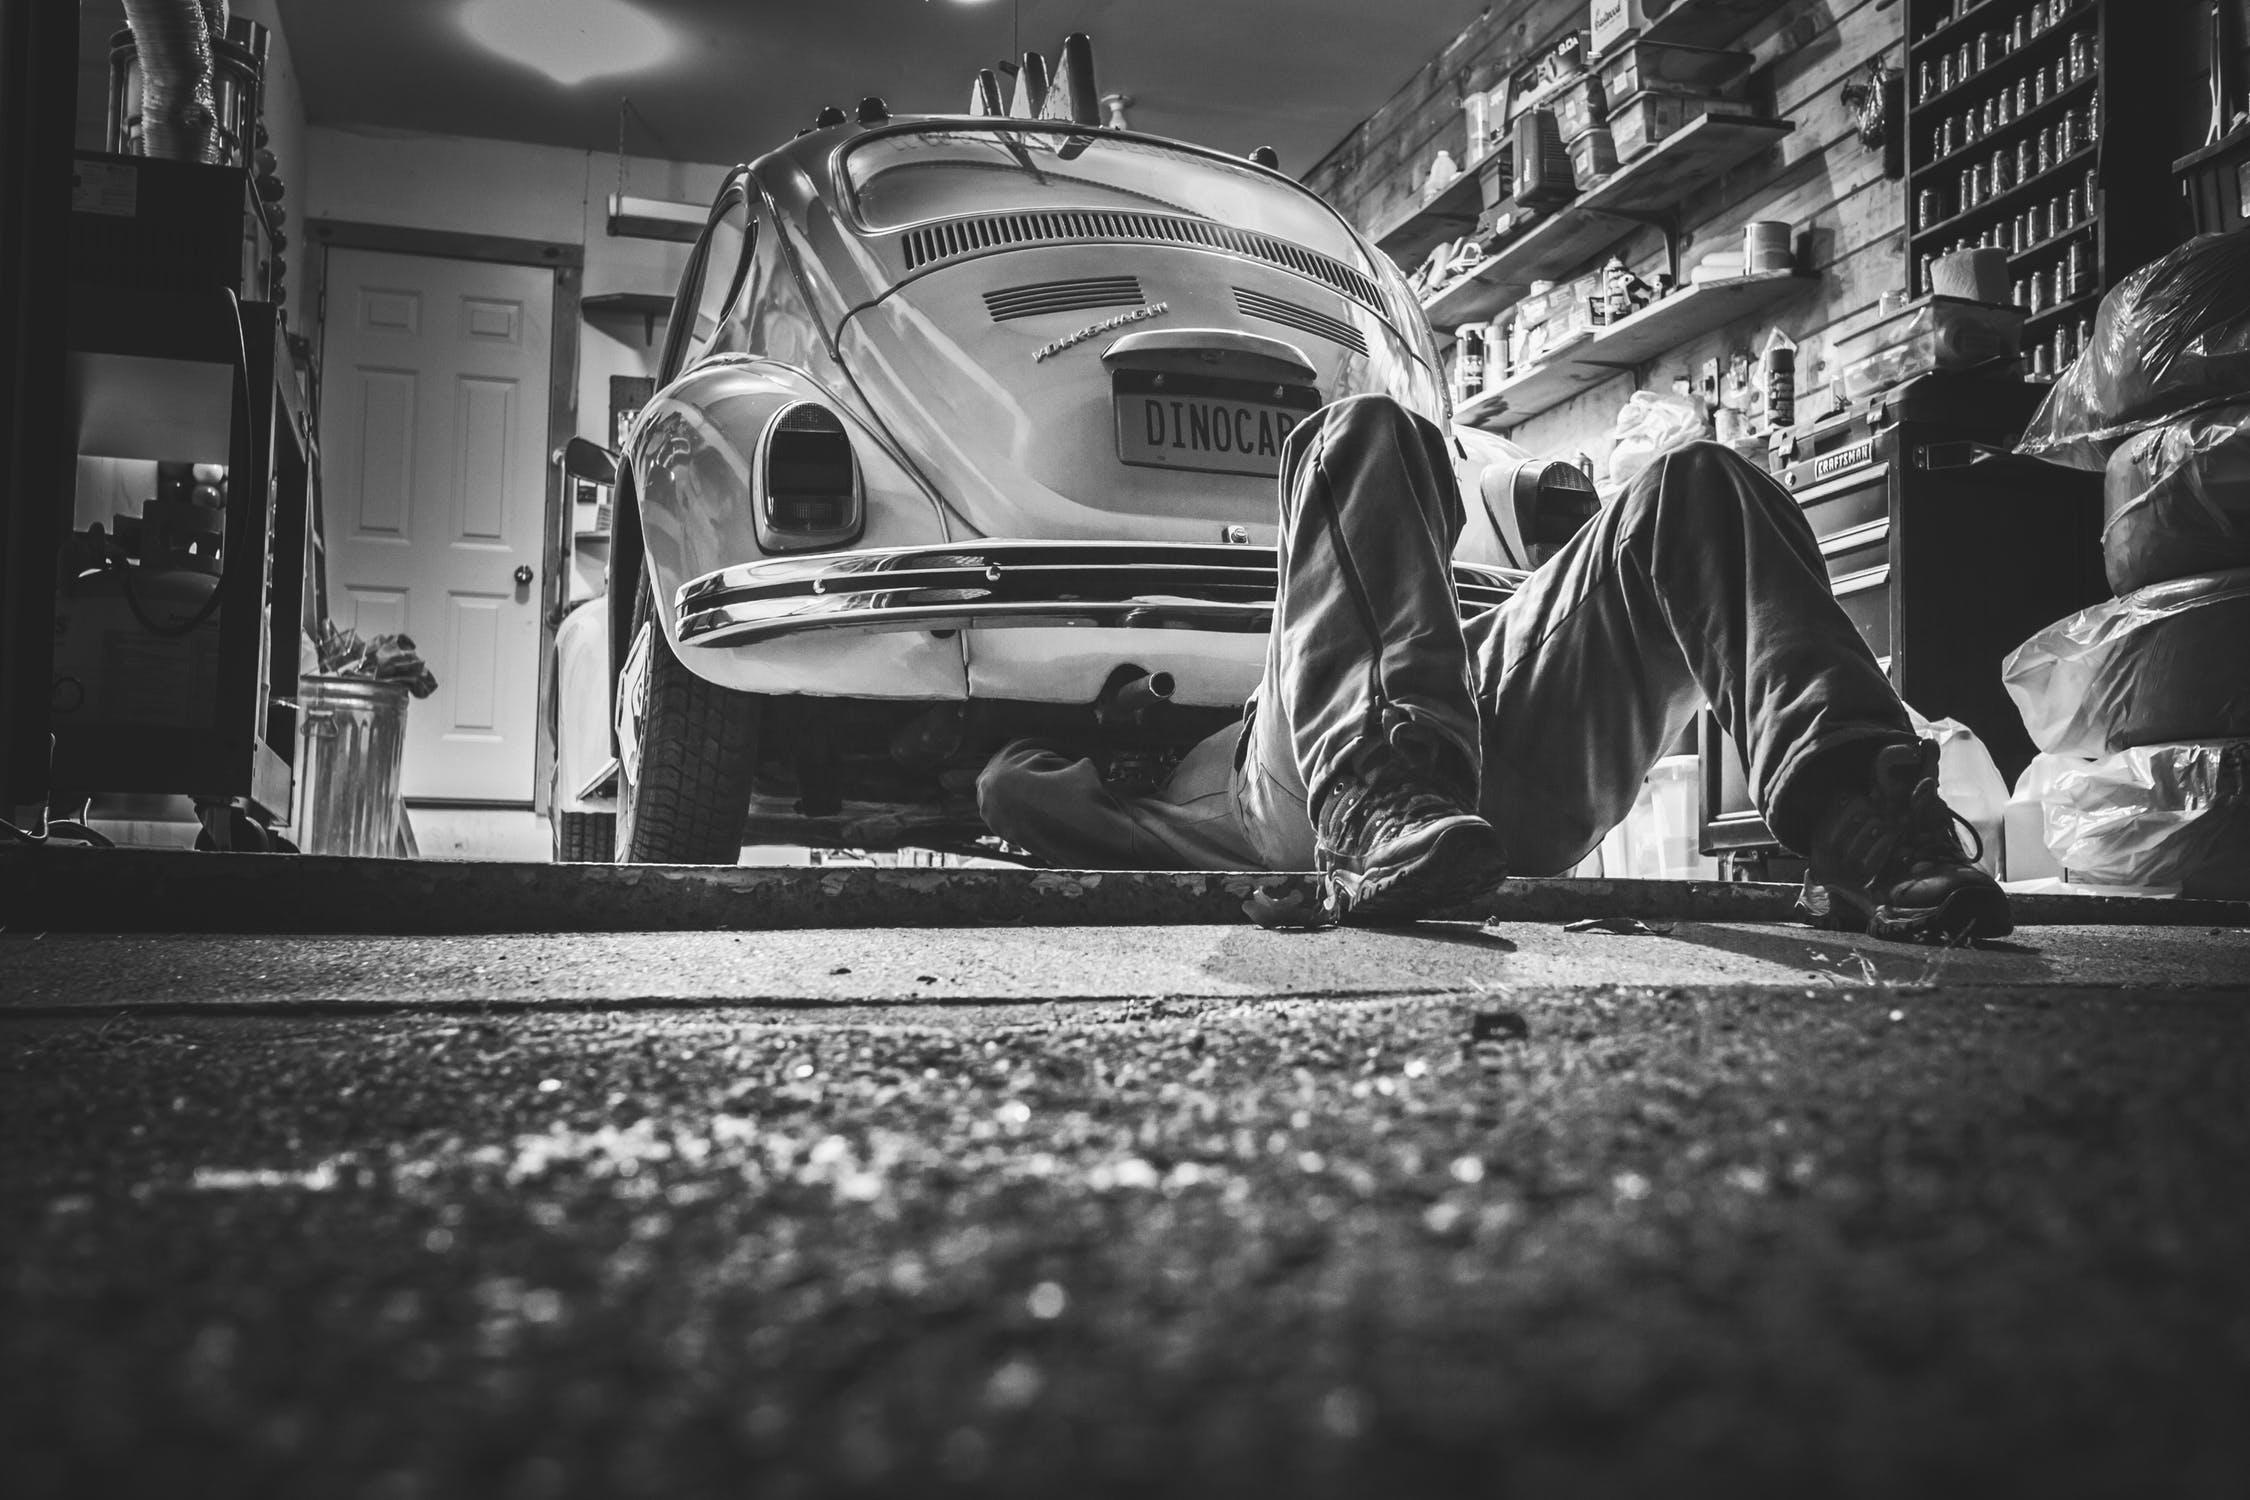 2019 Subaru Crosstrek Blind Spot monitoring